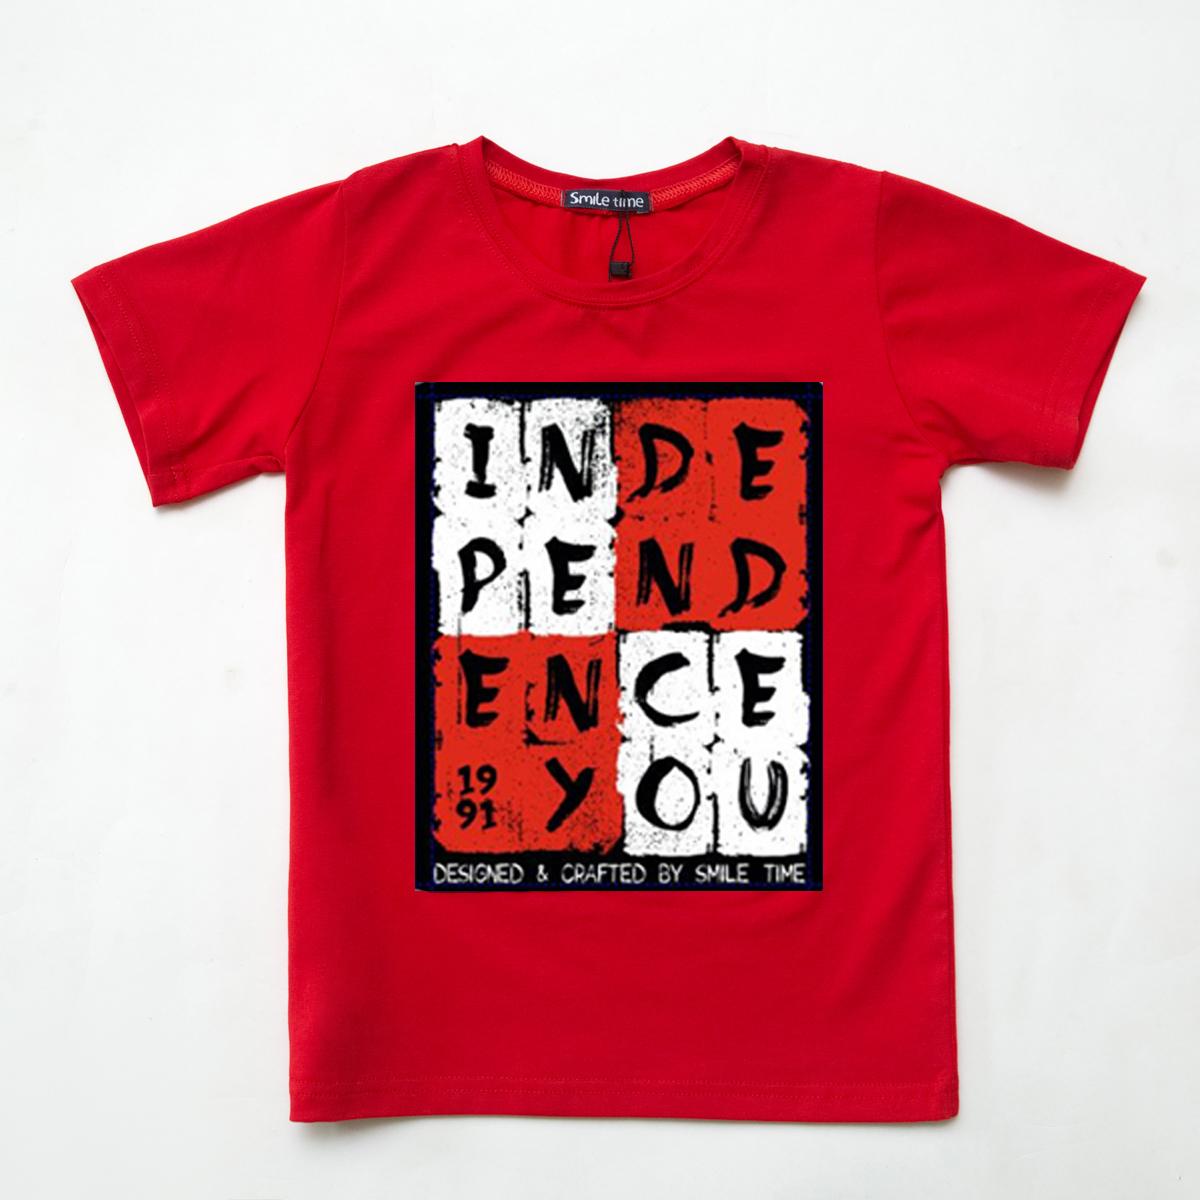 Футболка молодіжна, для хлопчика, Independents, червона, SmileTime